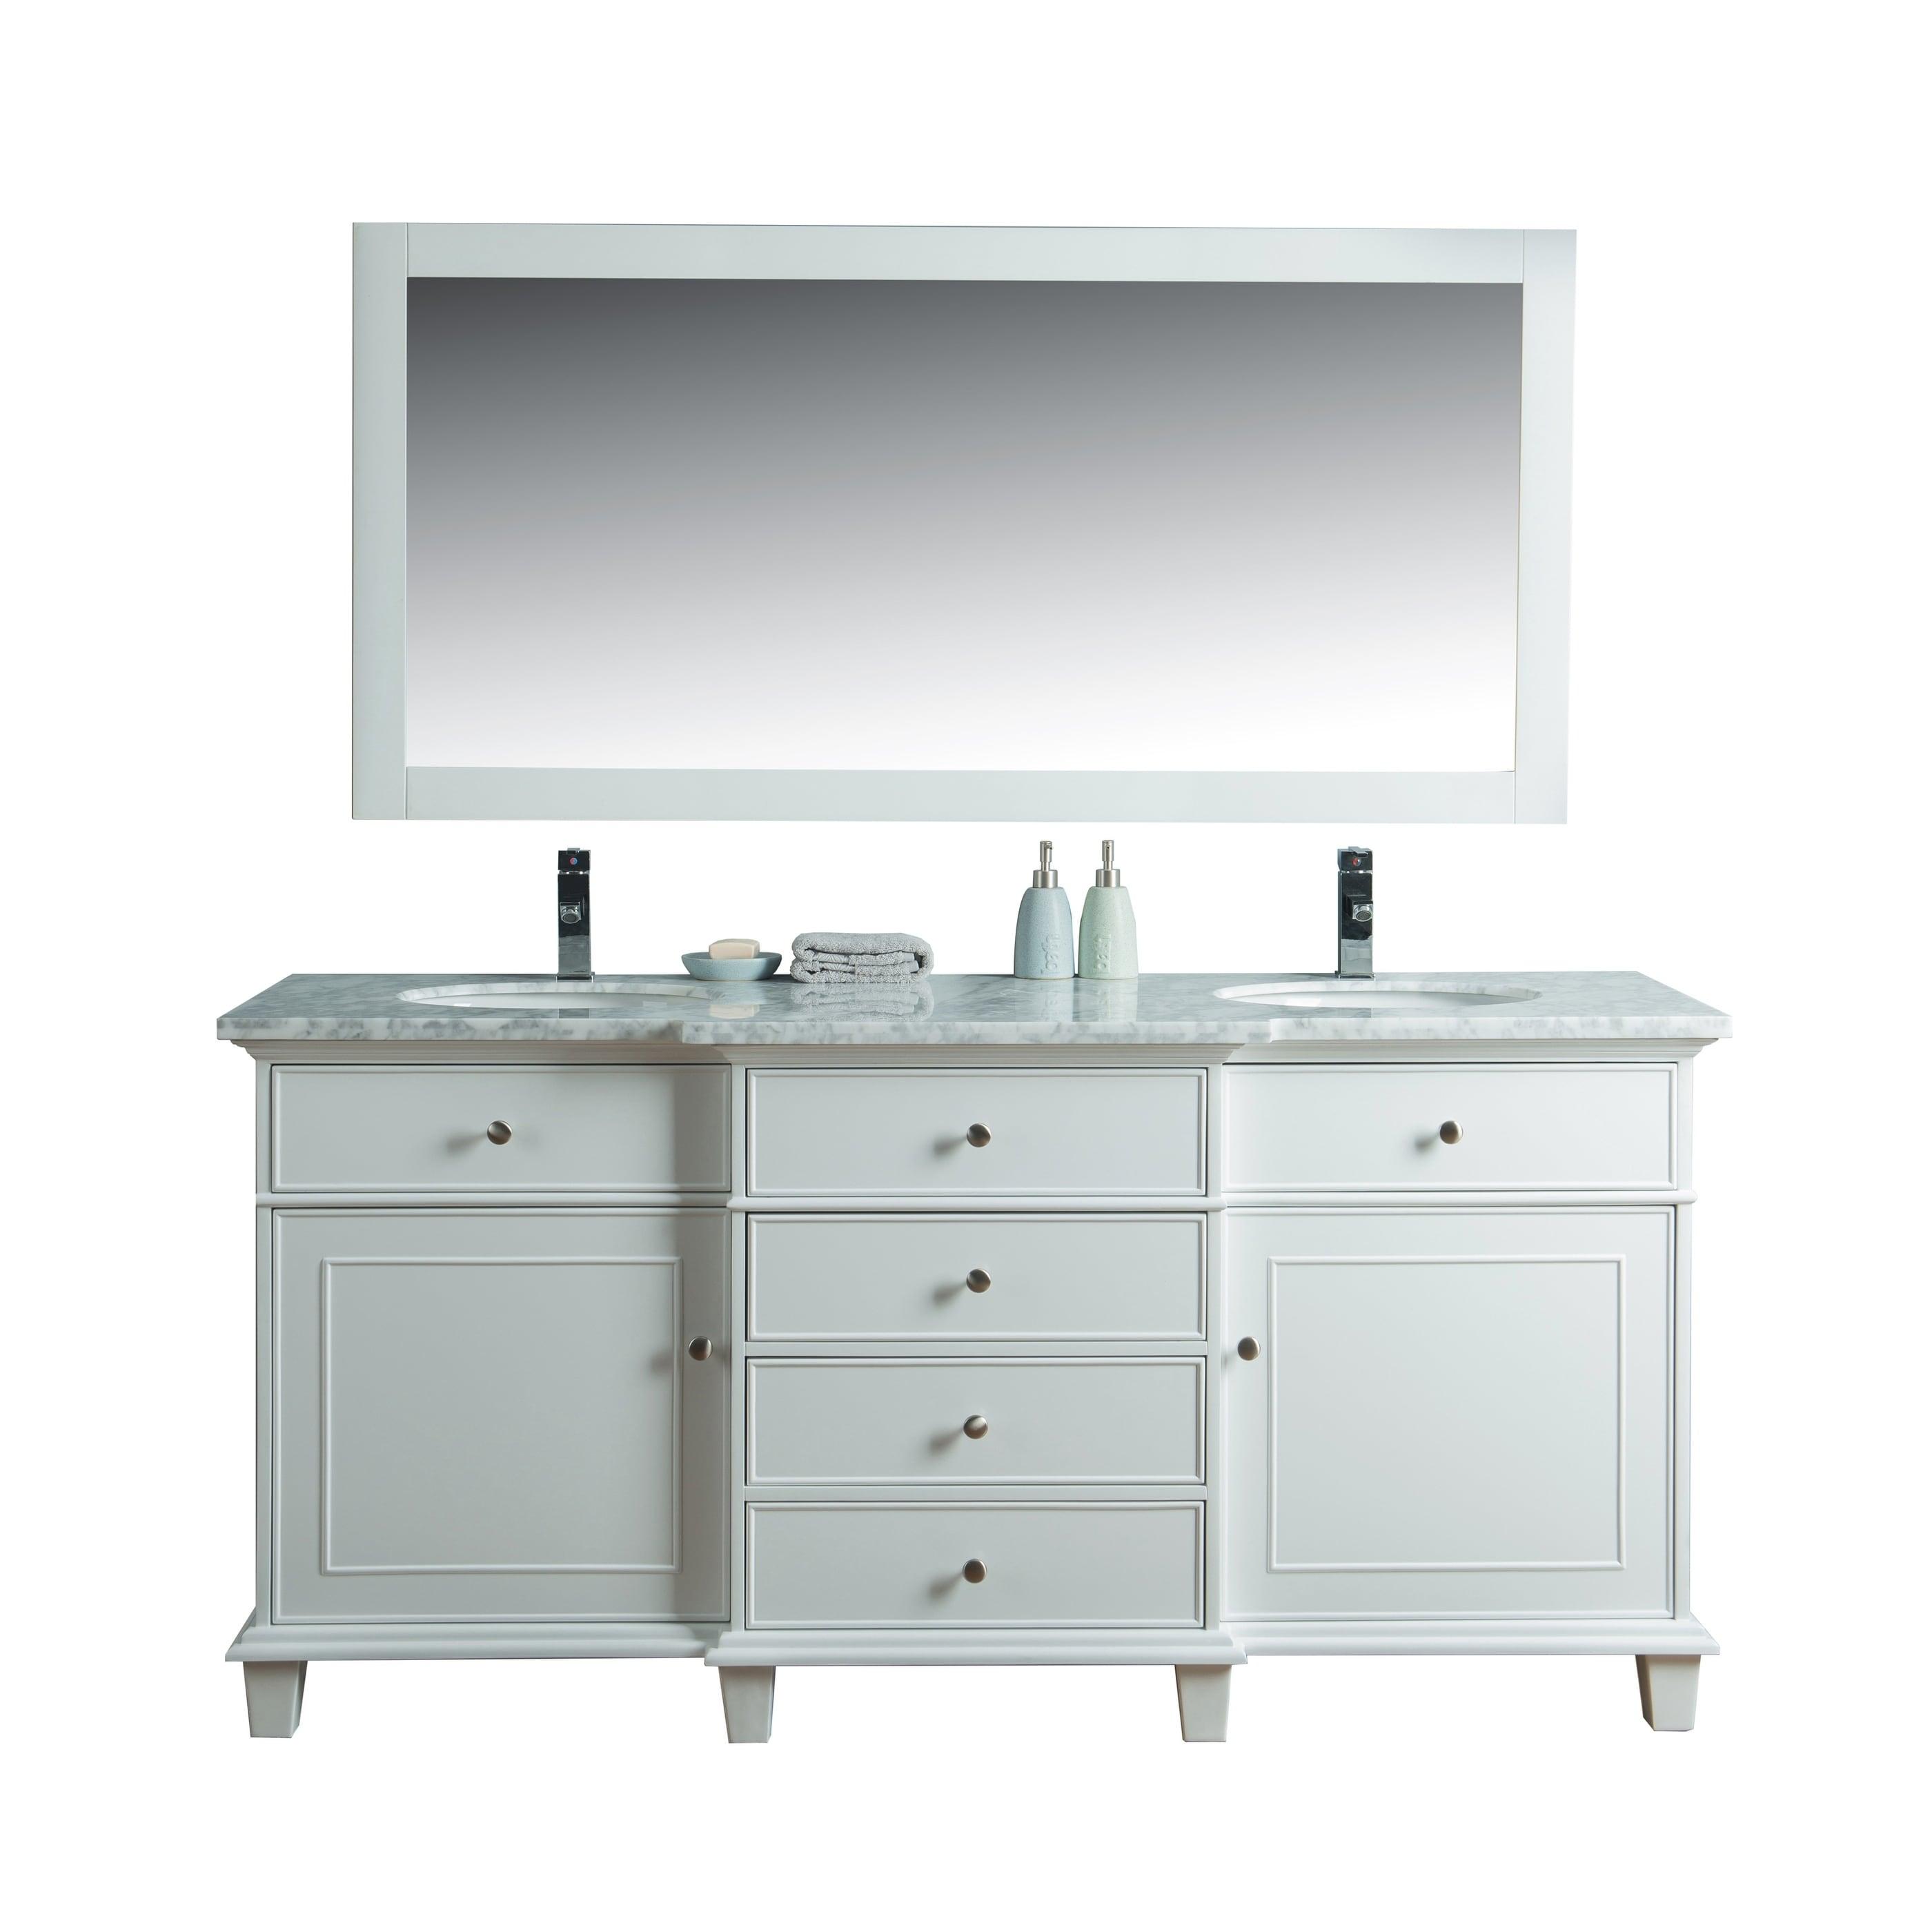 Shop Stufurhome Cadence White 60-inch Double Sink Bathroom Vanity ...